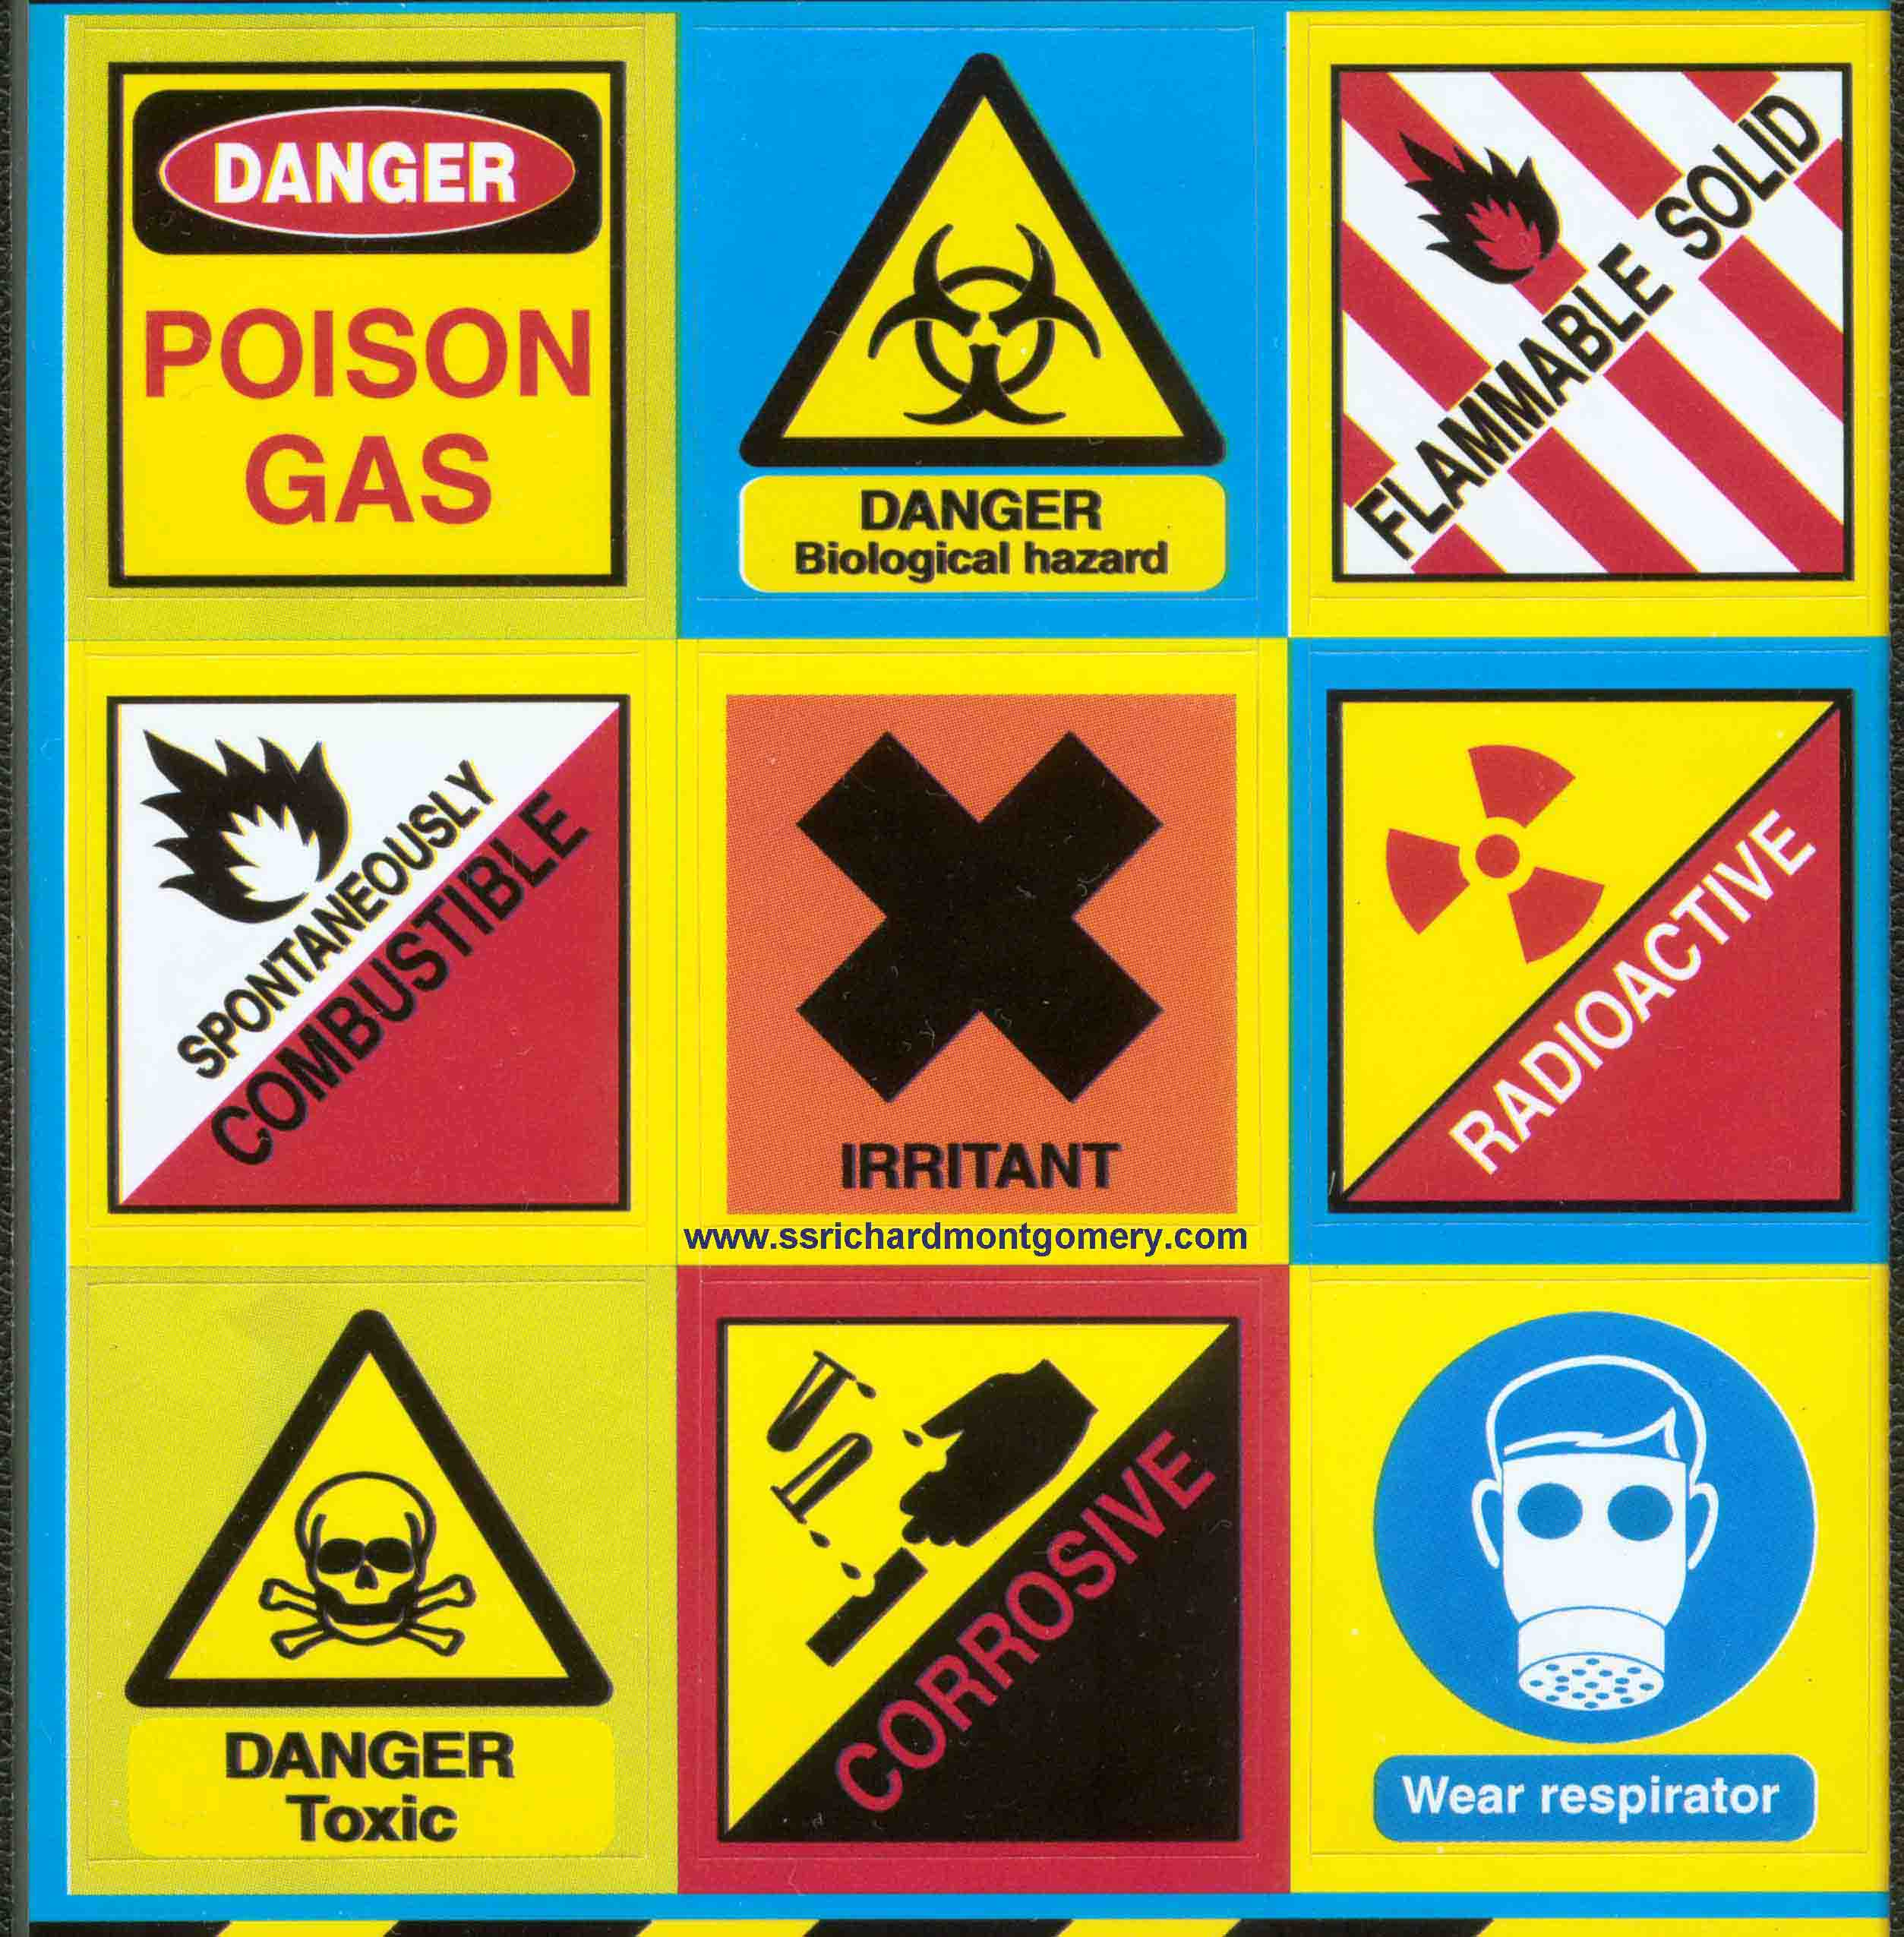 Kent chemical case study